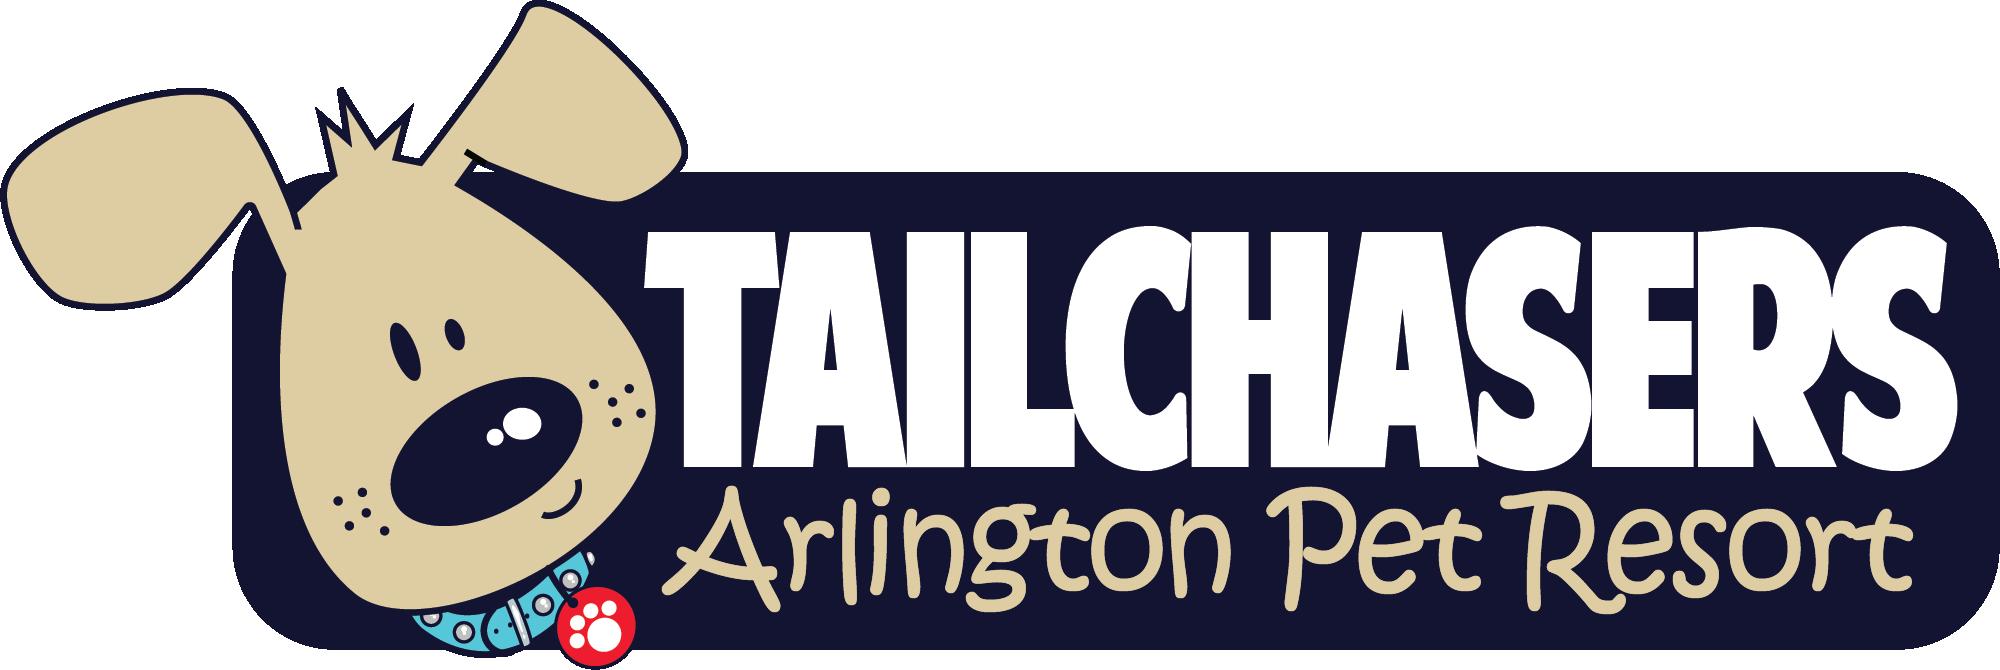 Arlington Dog Resort